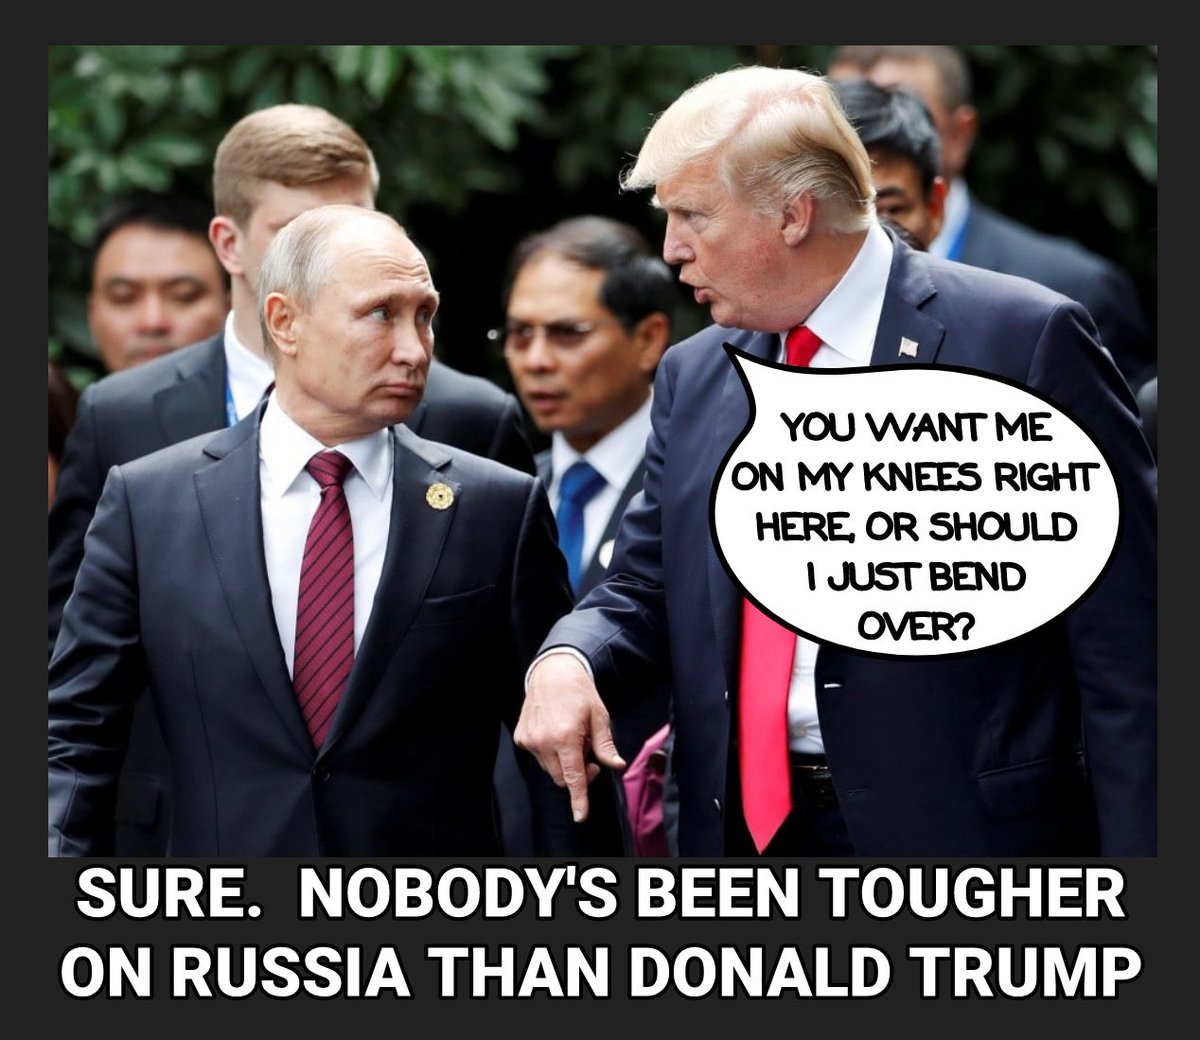 @realDonaldTrump @MariaBartiromo #TraitorTrump #CowardInChief #TraitorInChief #PutinsPuppet #PutinsGOP  #BountiesForKillingUSTroops